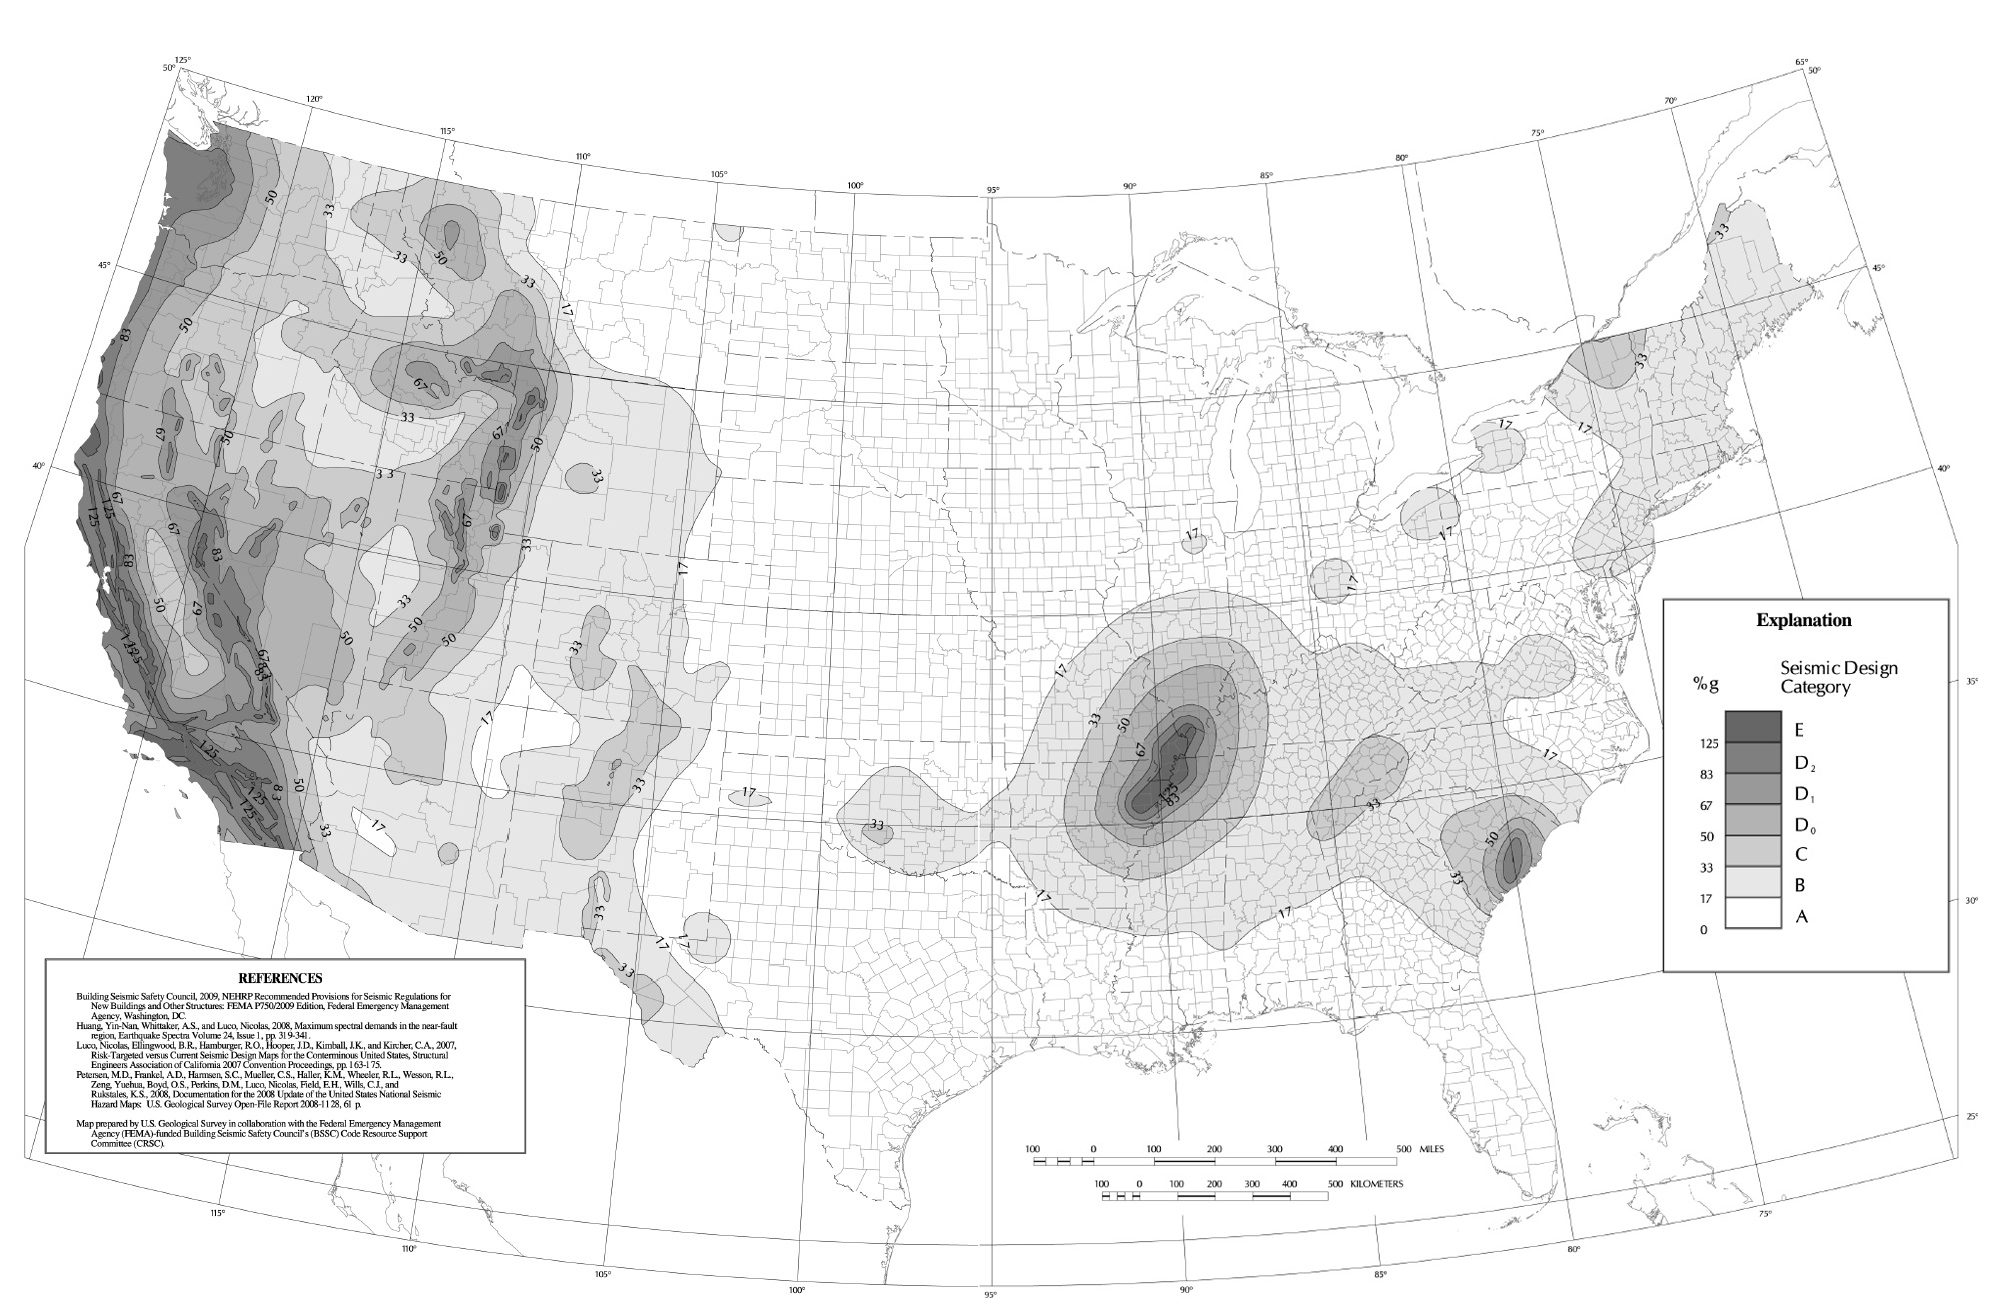 Seismic Design Category Map Karmaboxers - Washington dc earthquake map